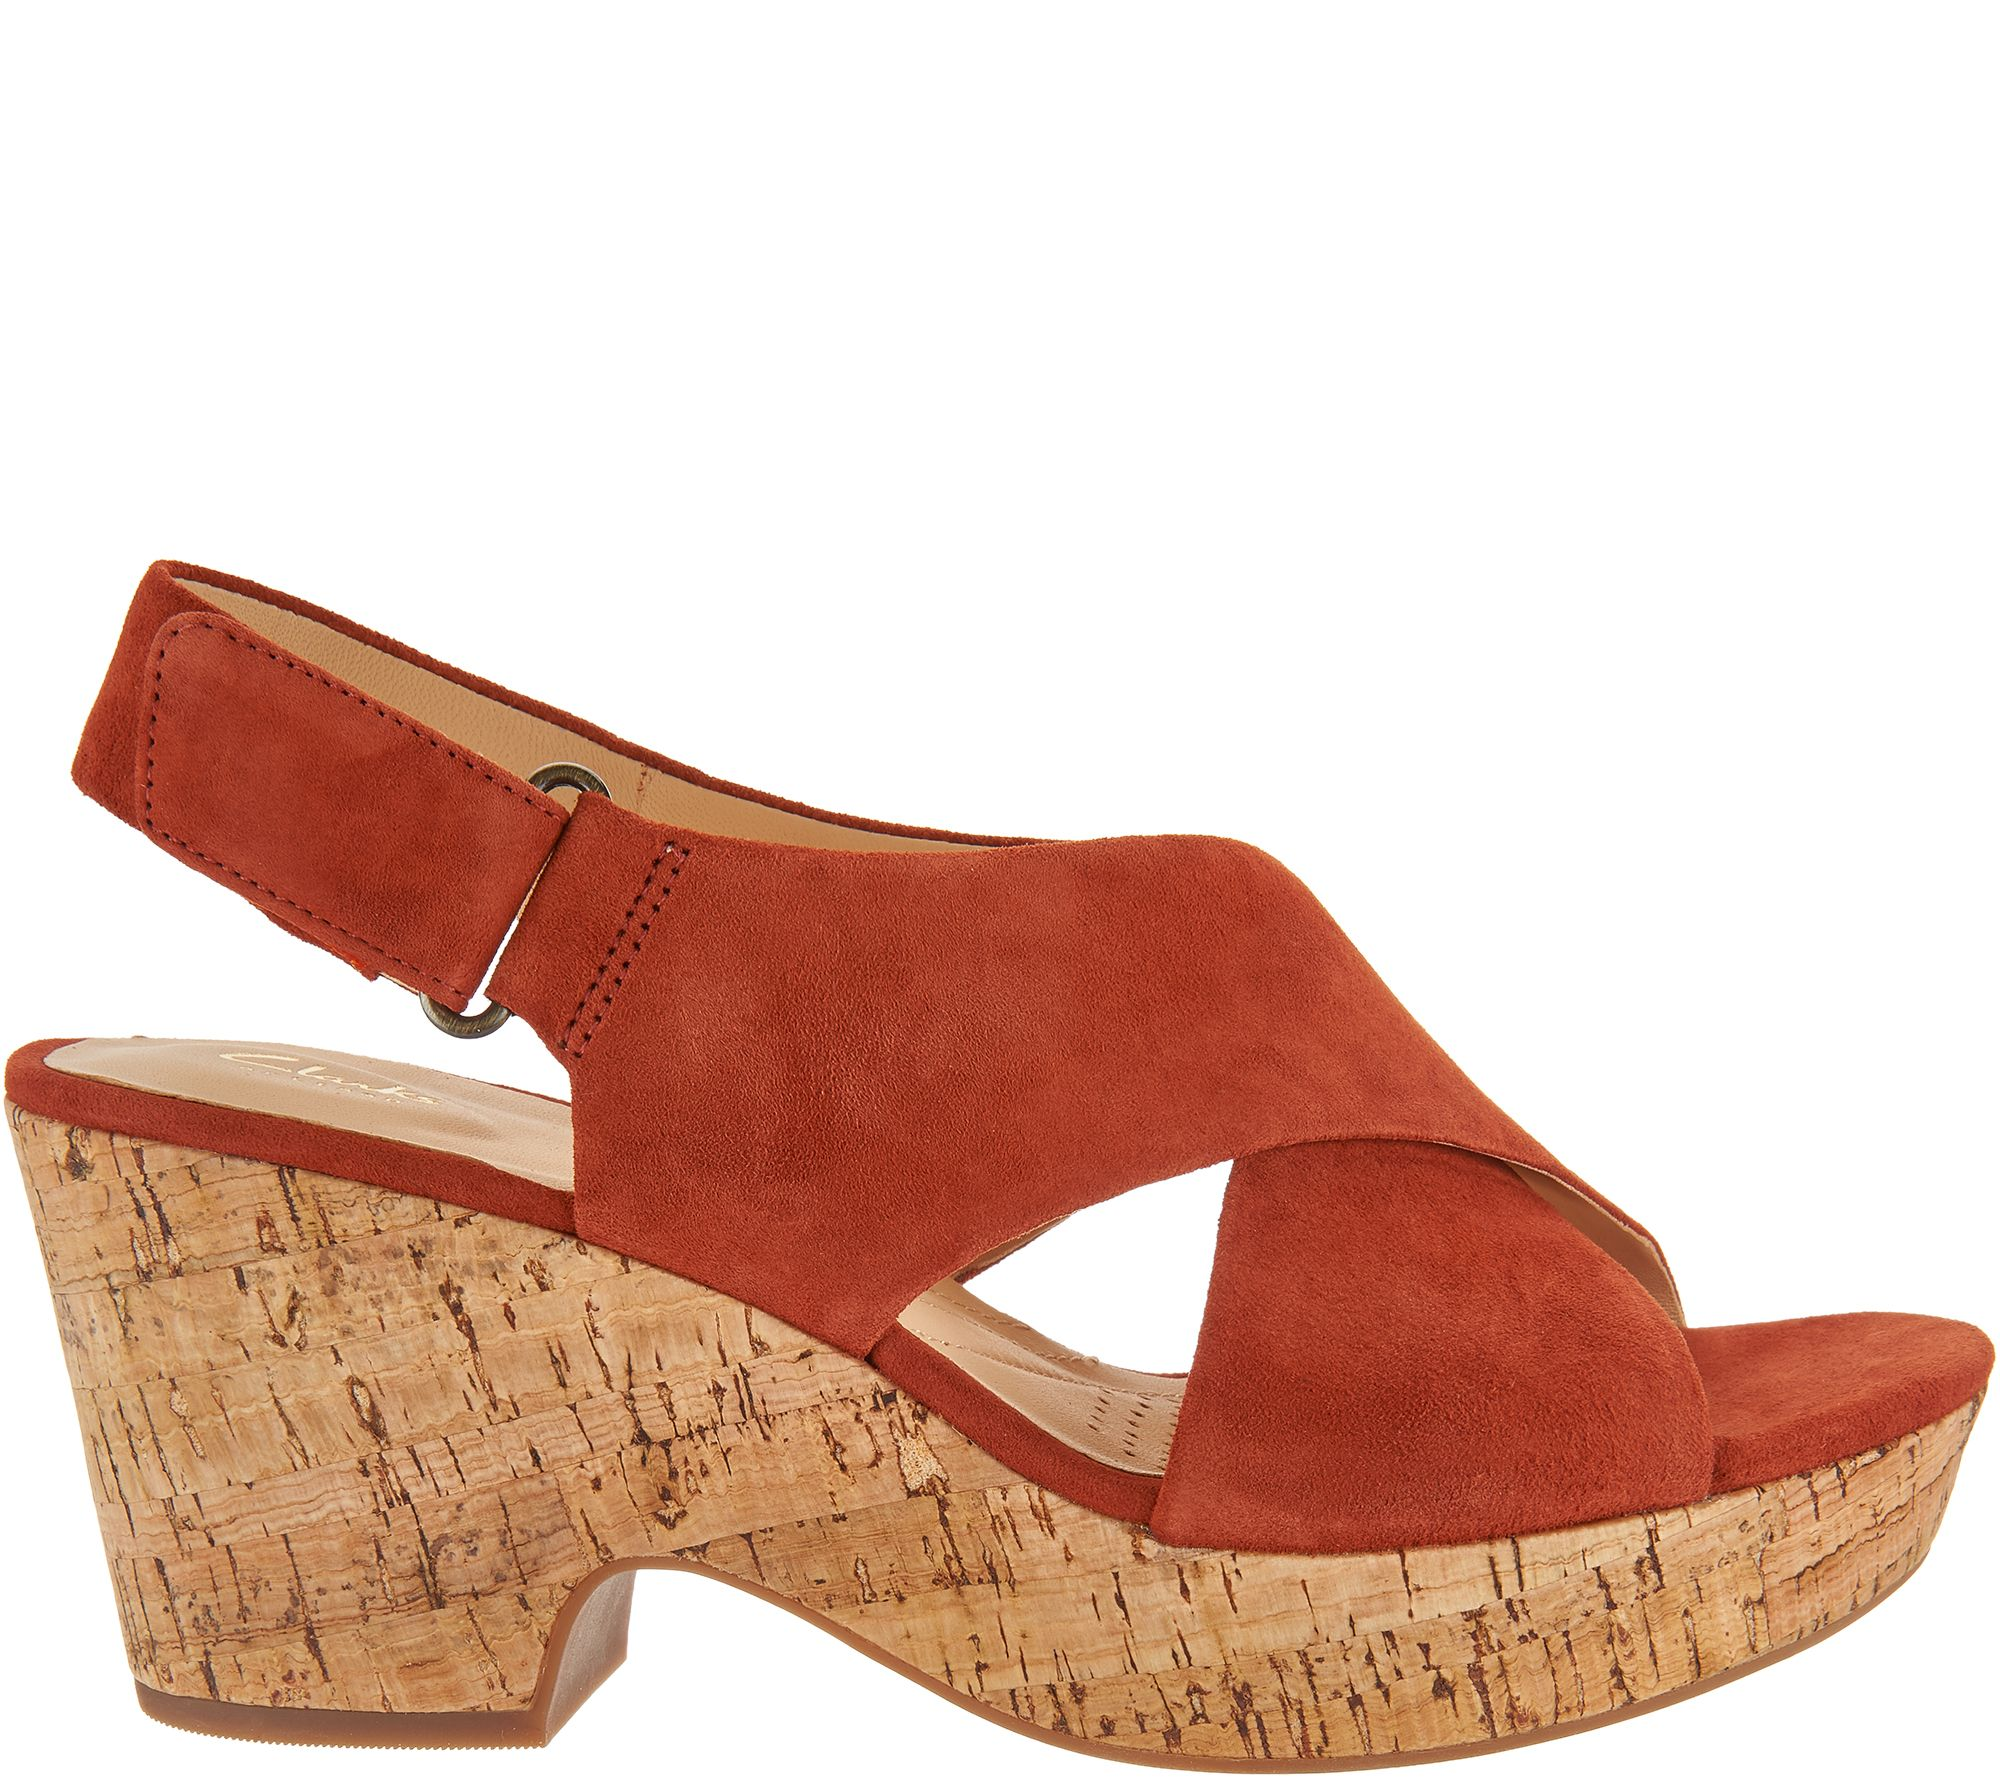 5f8c507ede1 Clarks Artisan Leather Adjustable Wedge Sandals - Maritsa Lara - Page 1 —  QVC.com